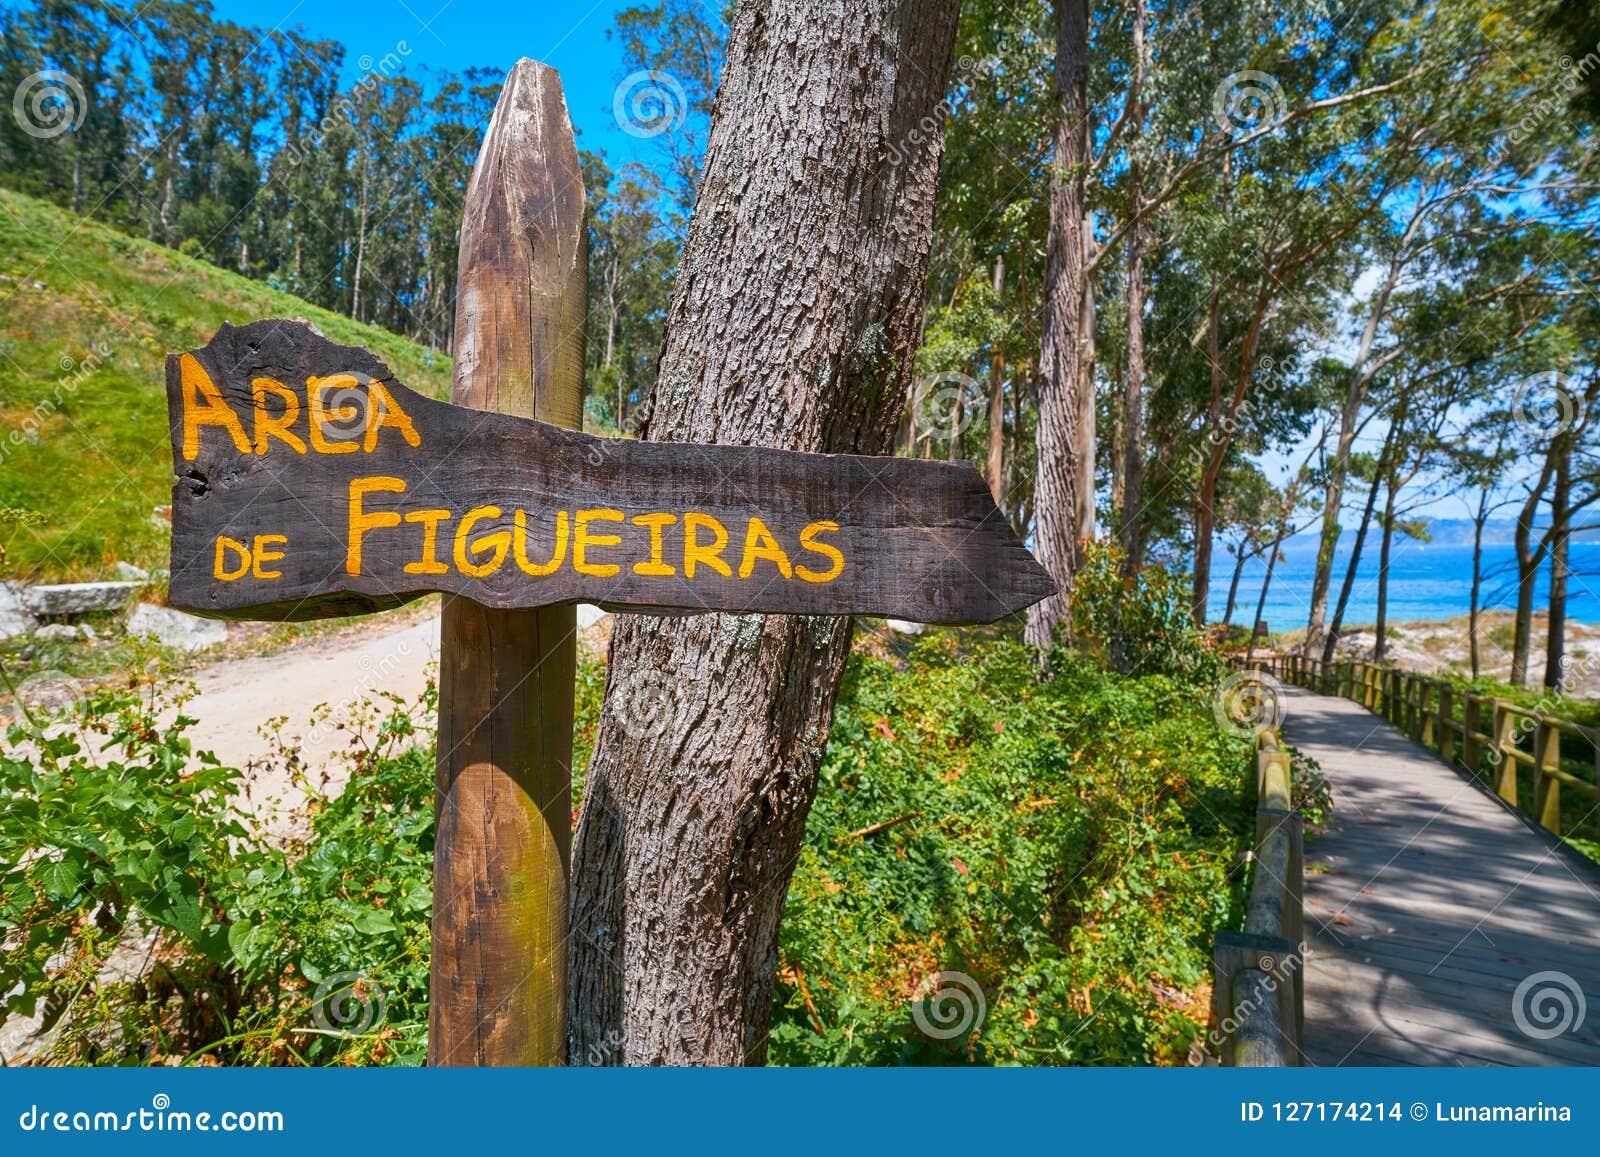 Figueiras nudist beach road sign in Islas Cies island